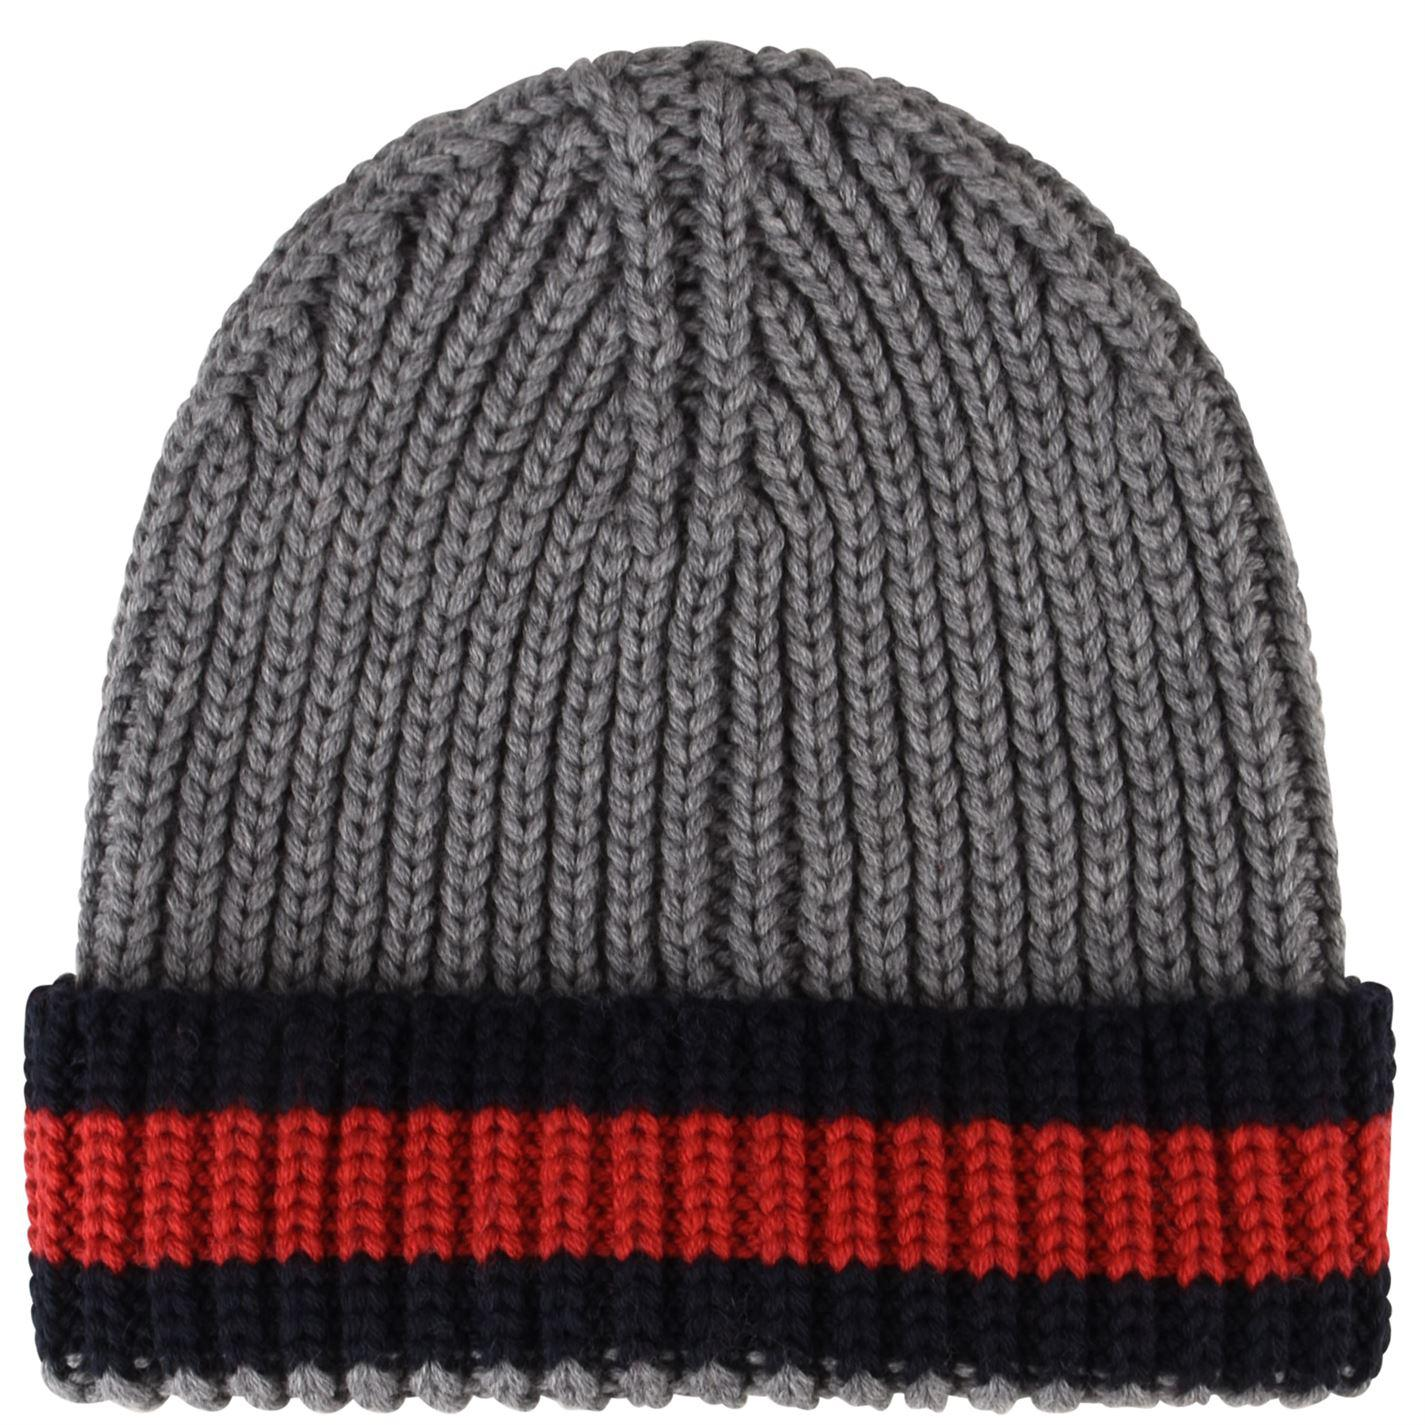 6d71398dd2d Lyst - Gucci Web Trim Beanie Hat in Gray for Men